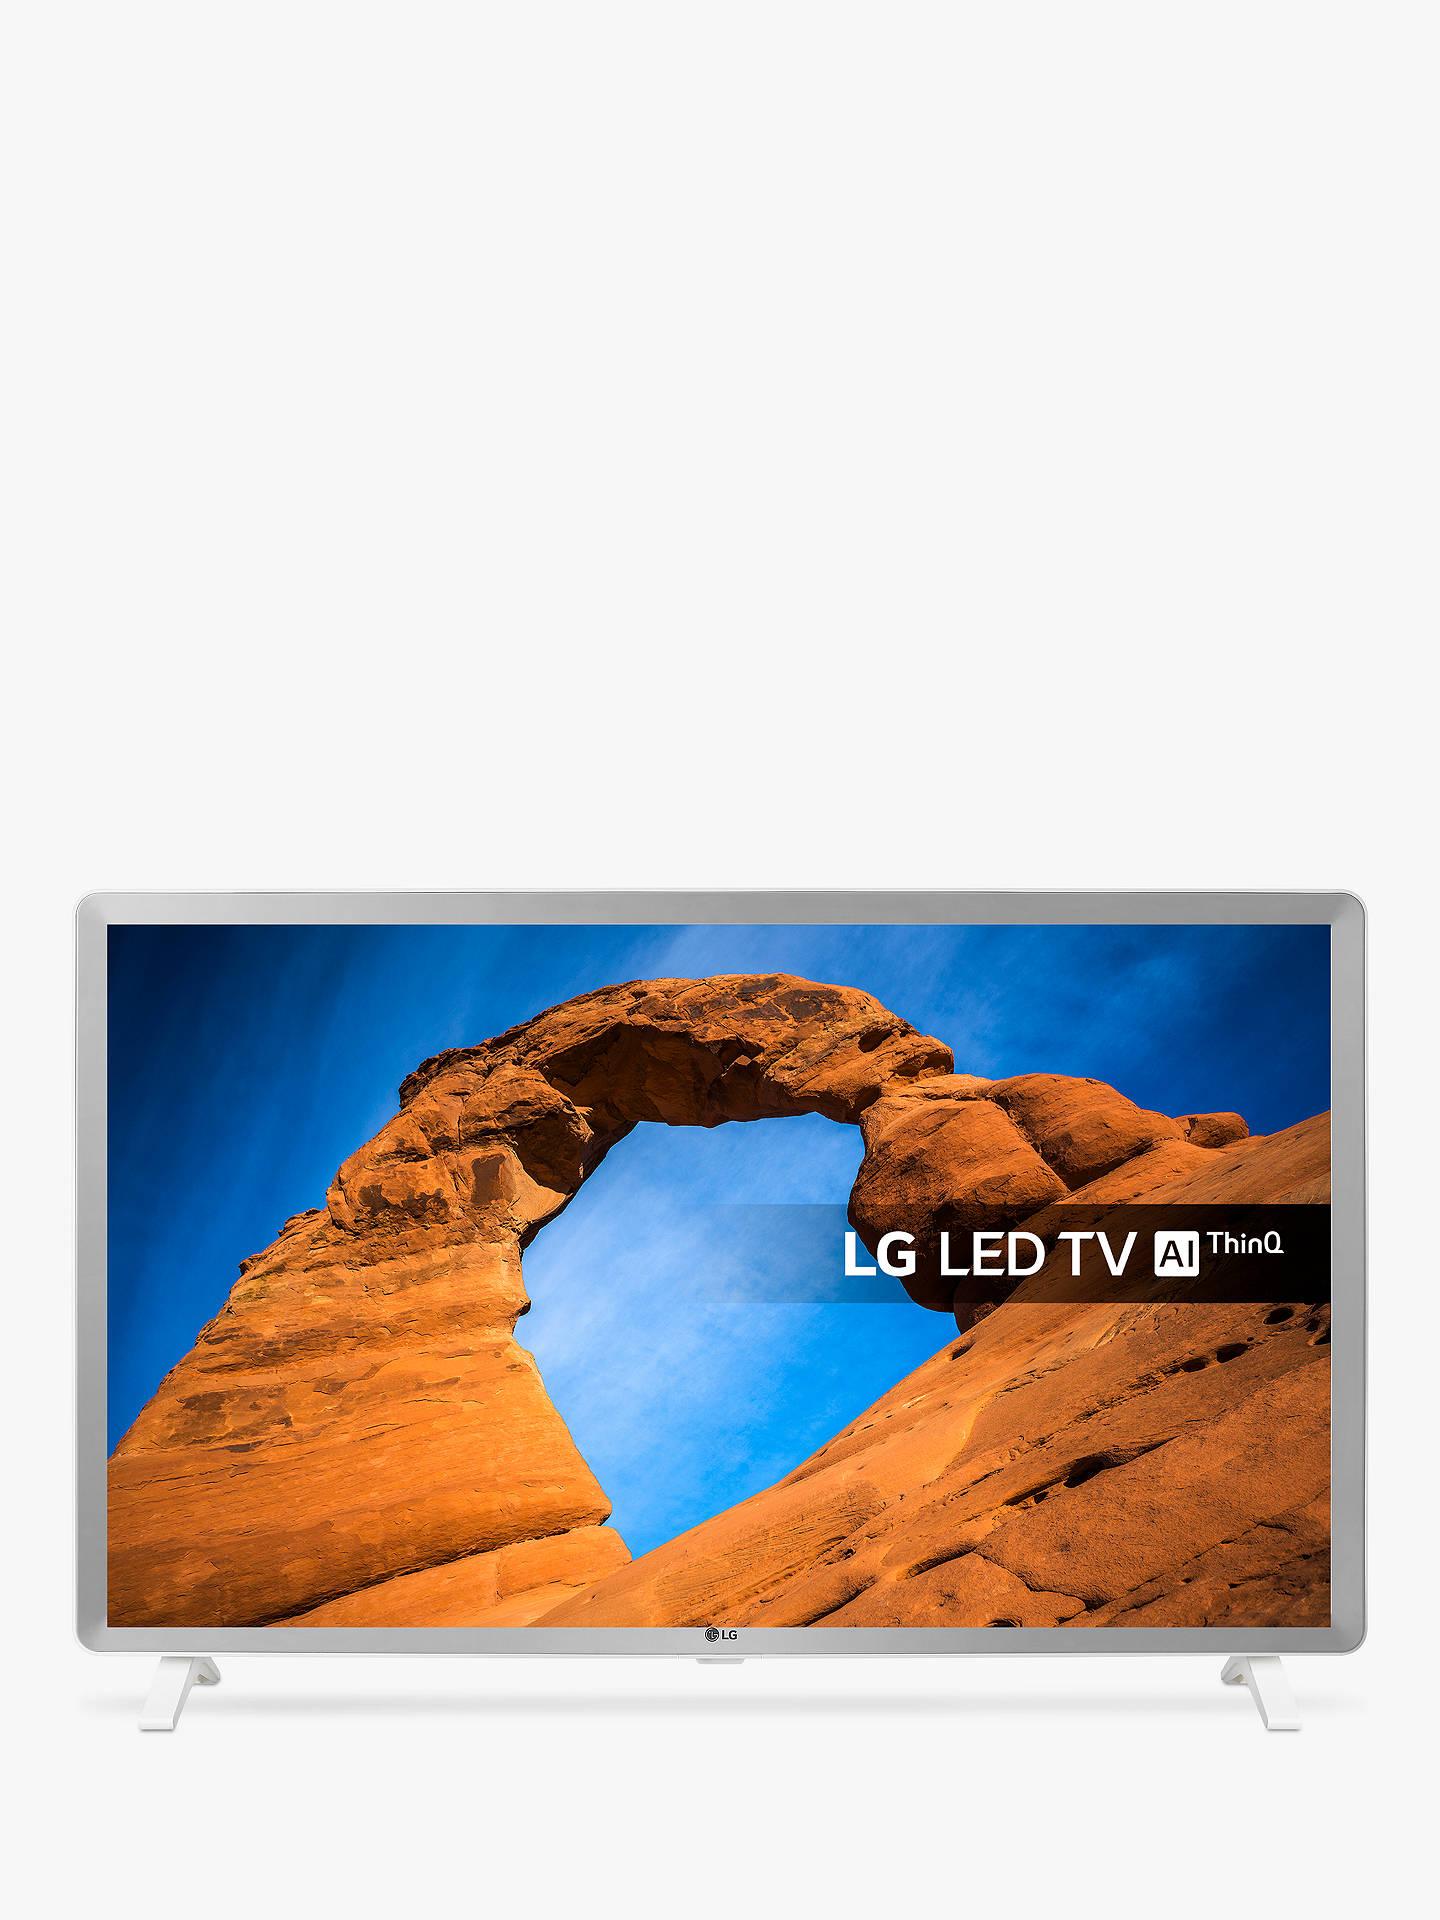 Lg smart tv ai thinq 32 inch